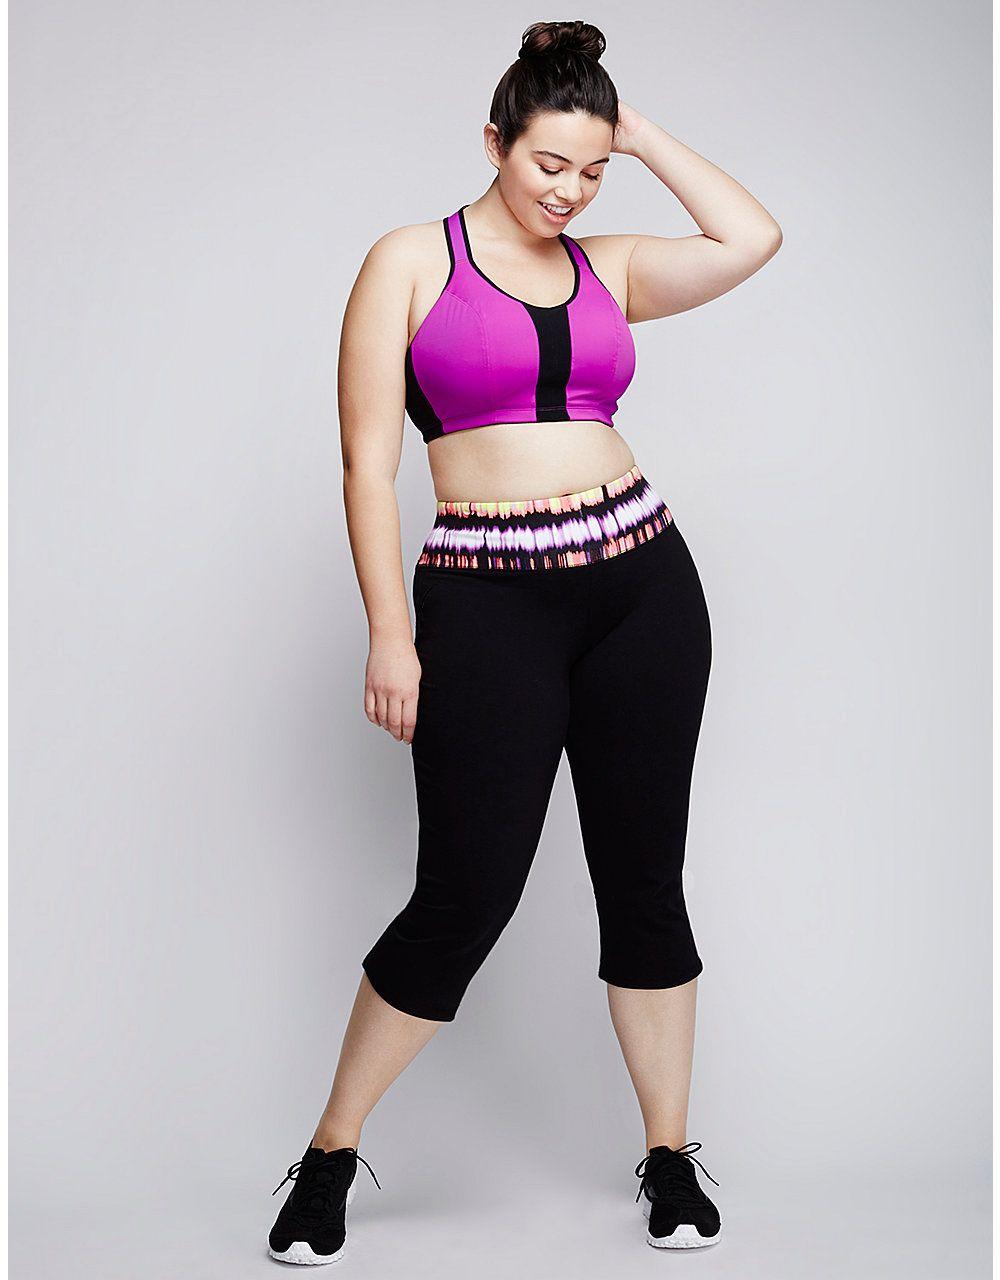 deb9713ebbf1f Signature Stretch logo yoga capri by Livi Active | Lane Bryant ...